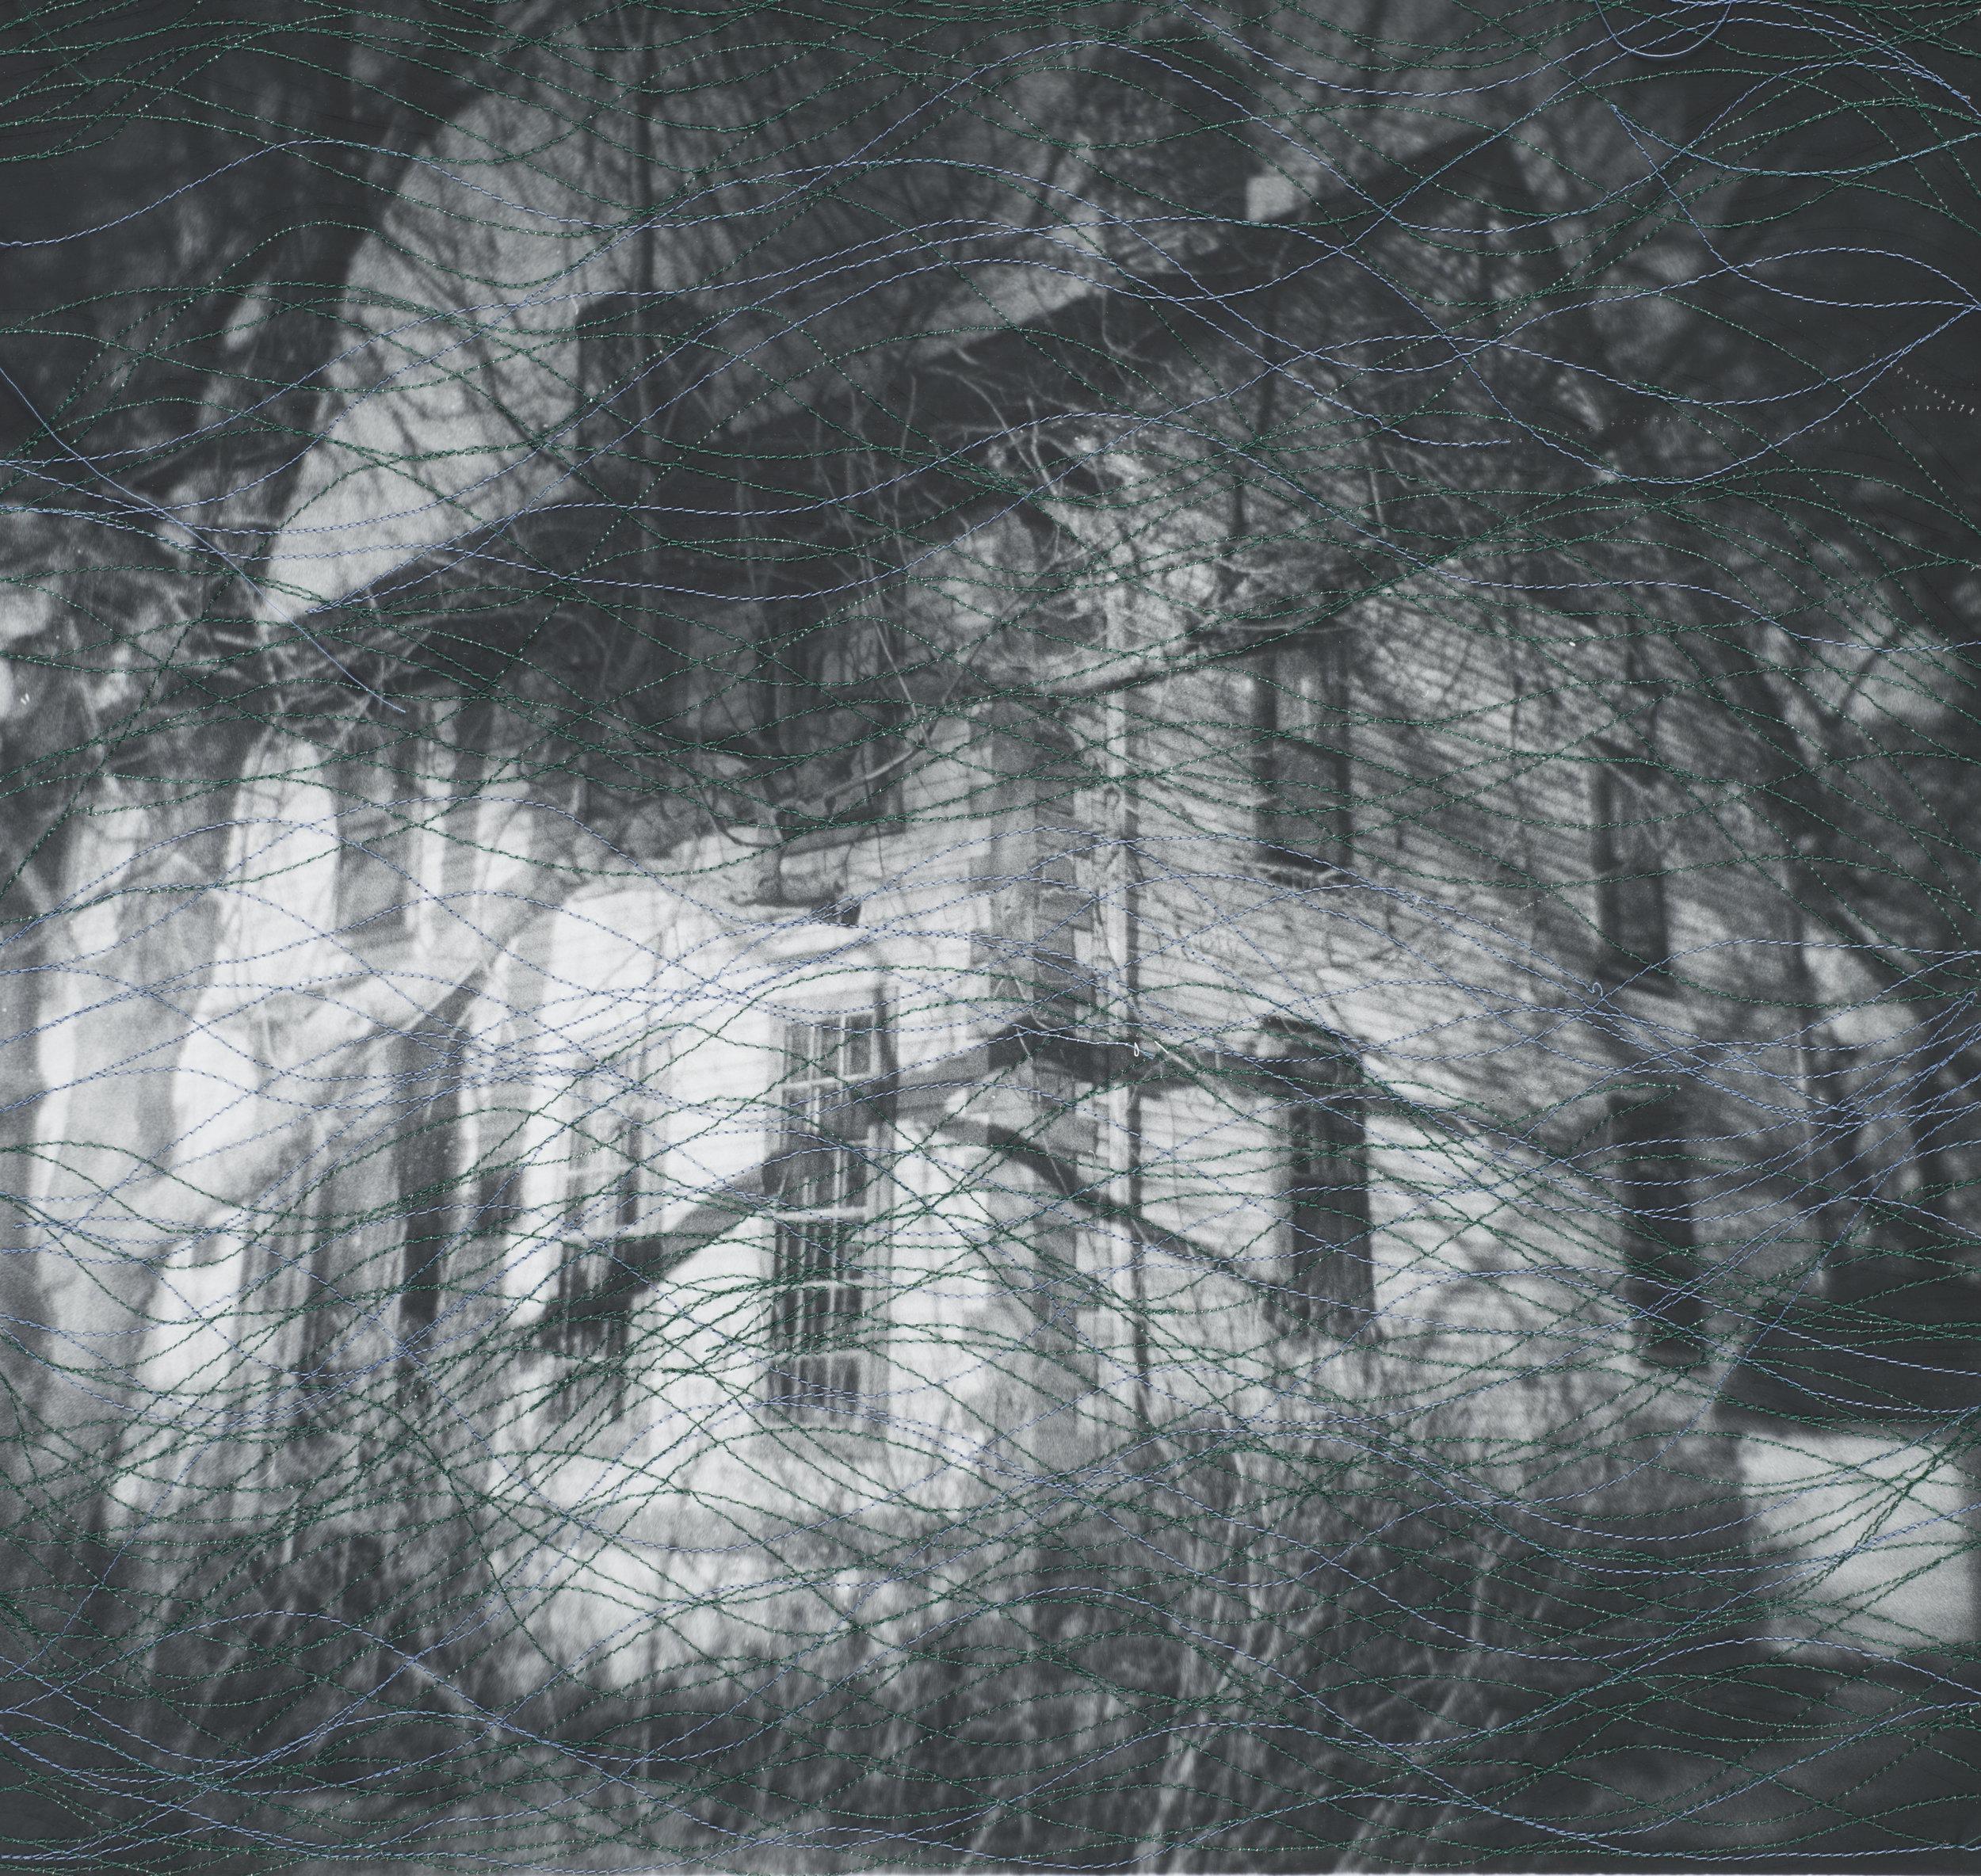 Haunted House, 2019 © Melissa Zexter